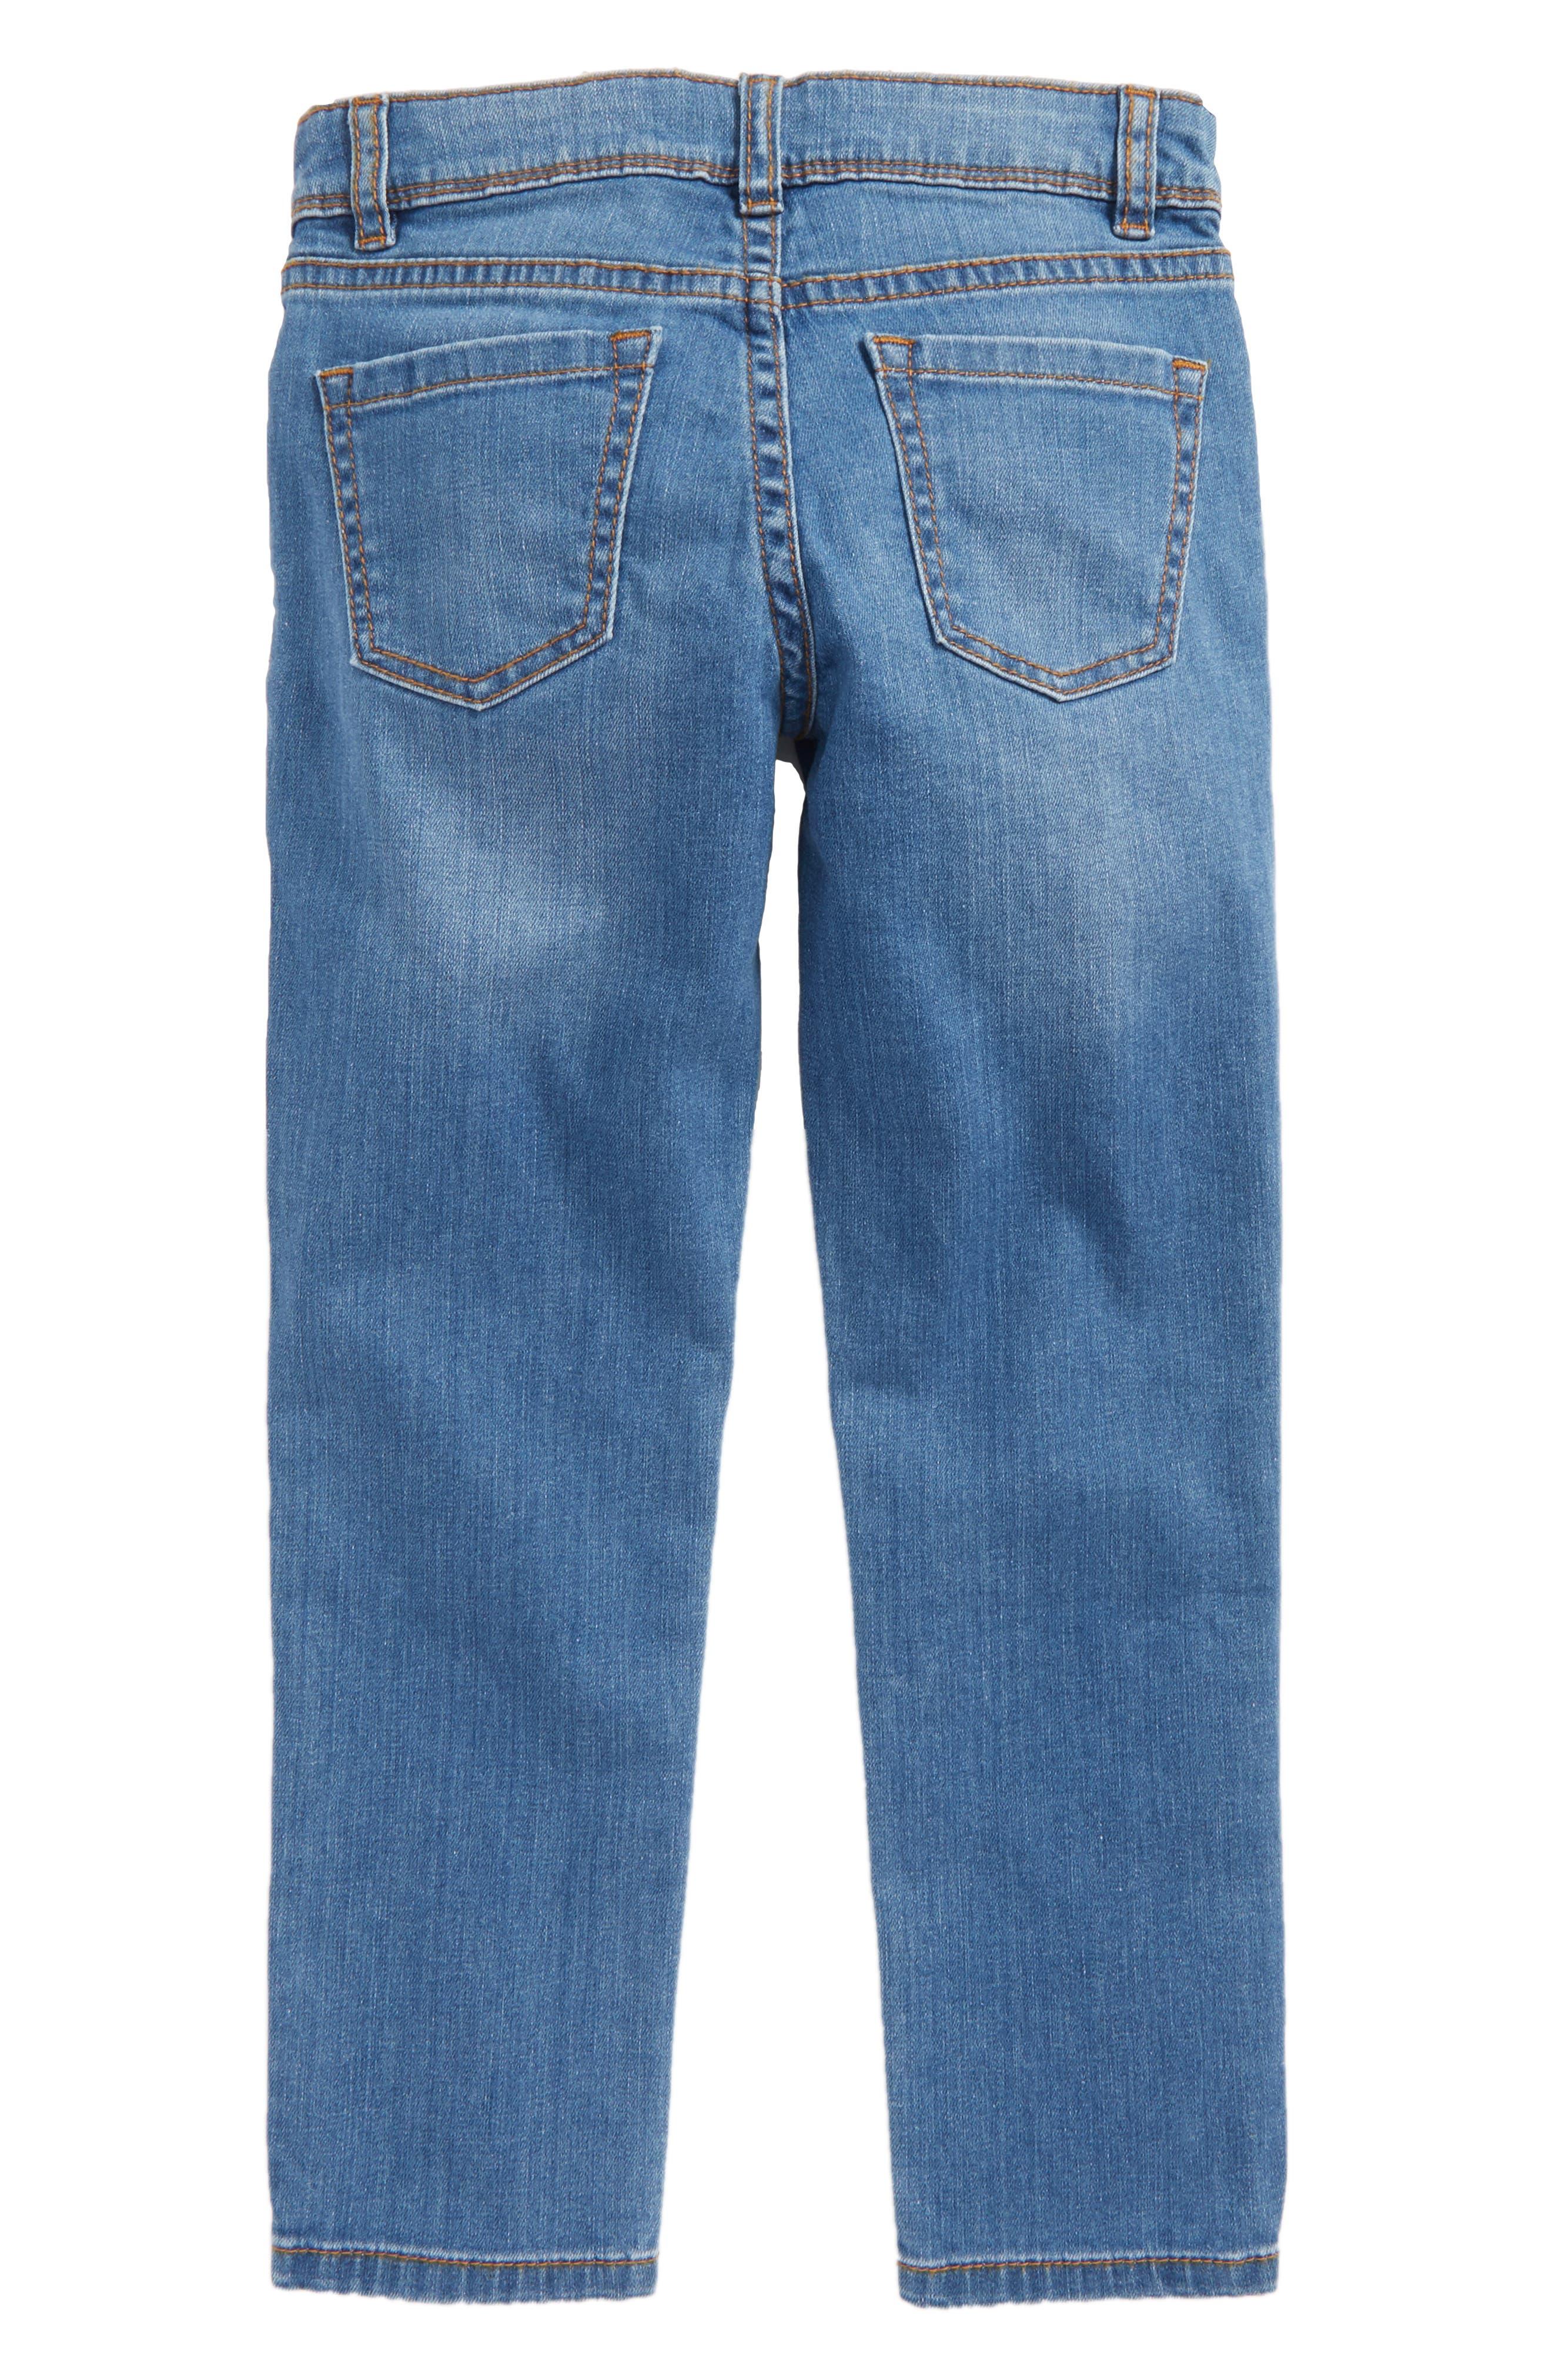 Skinny Jeans,                             Alternate thumbnail 2, color,                             Light Vintage Ldn